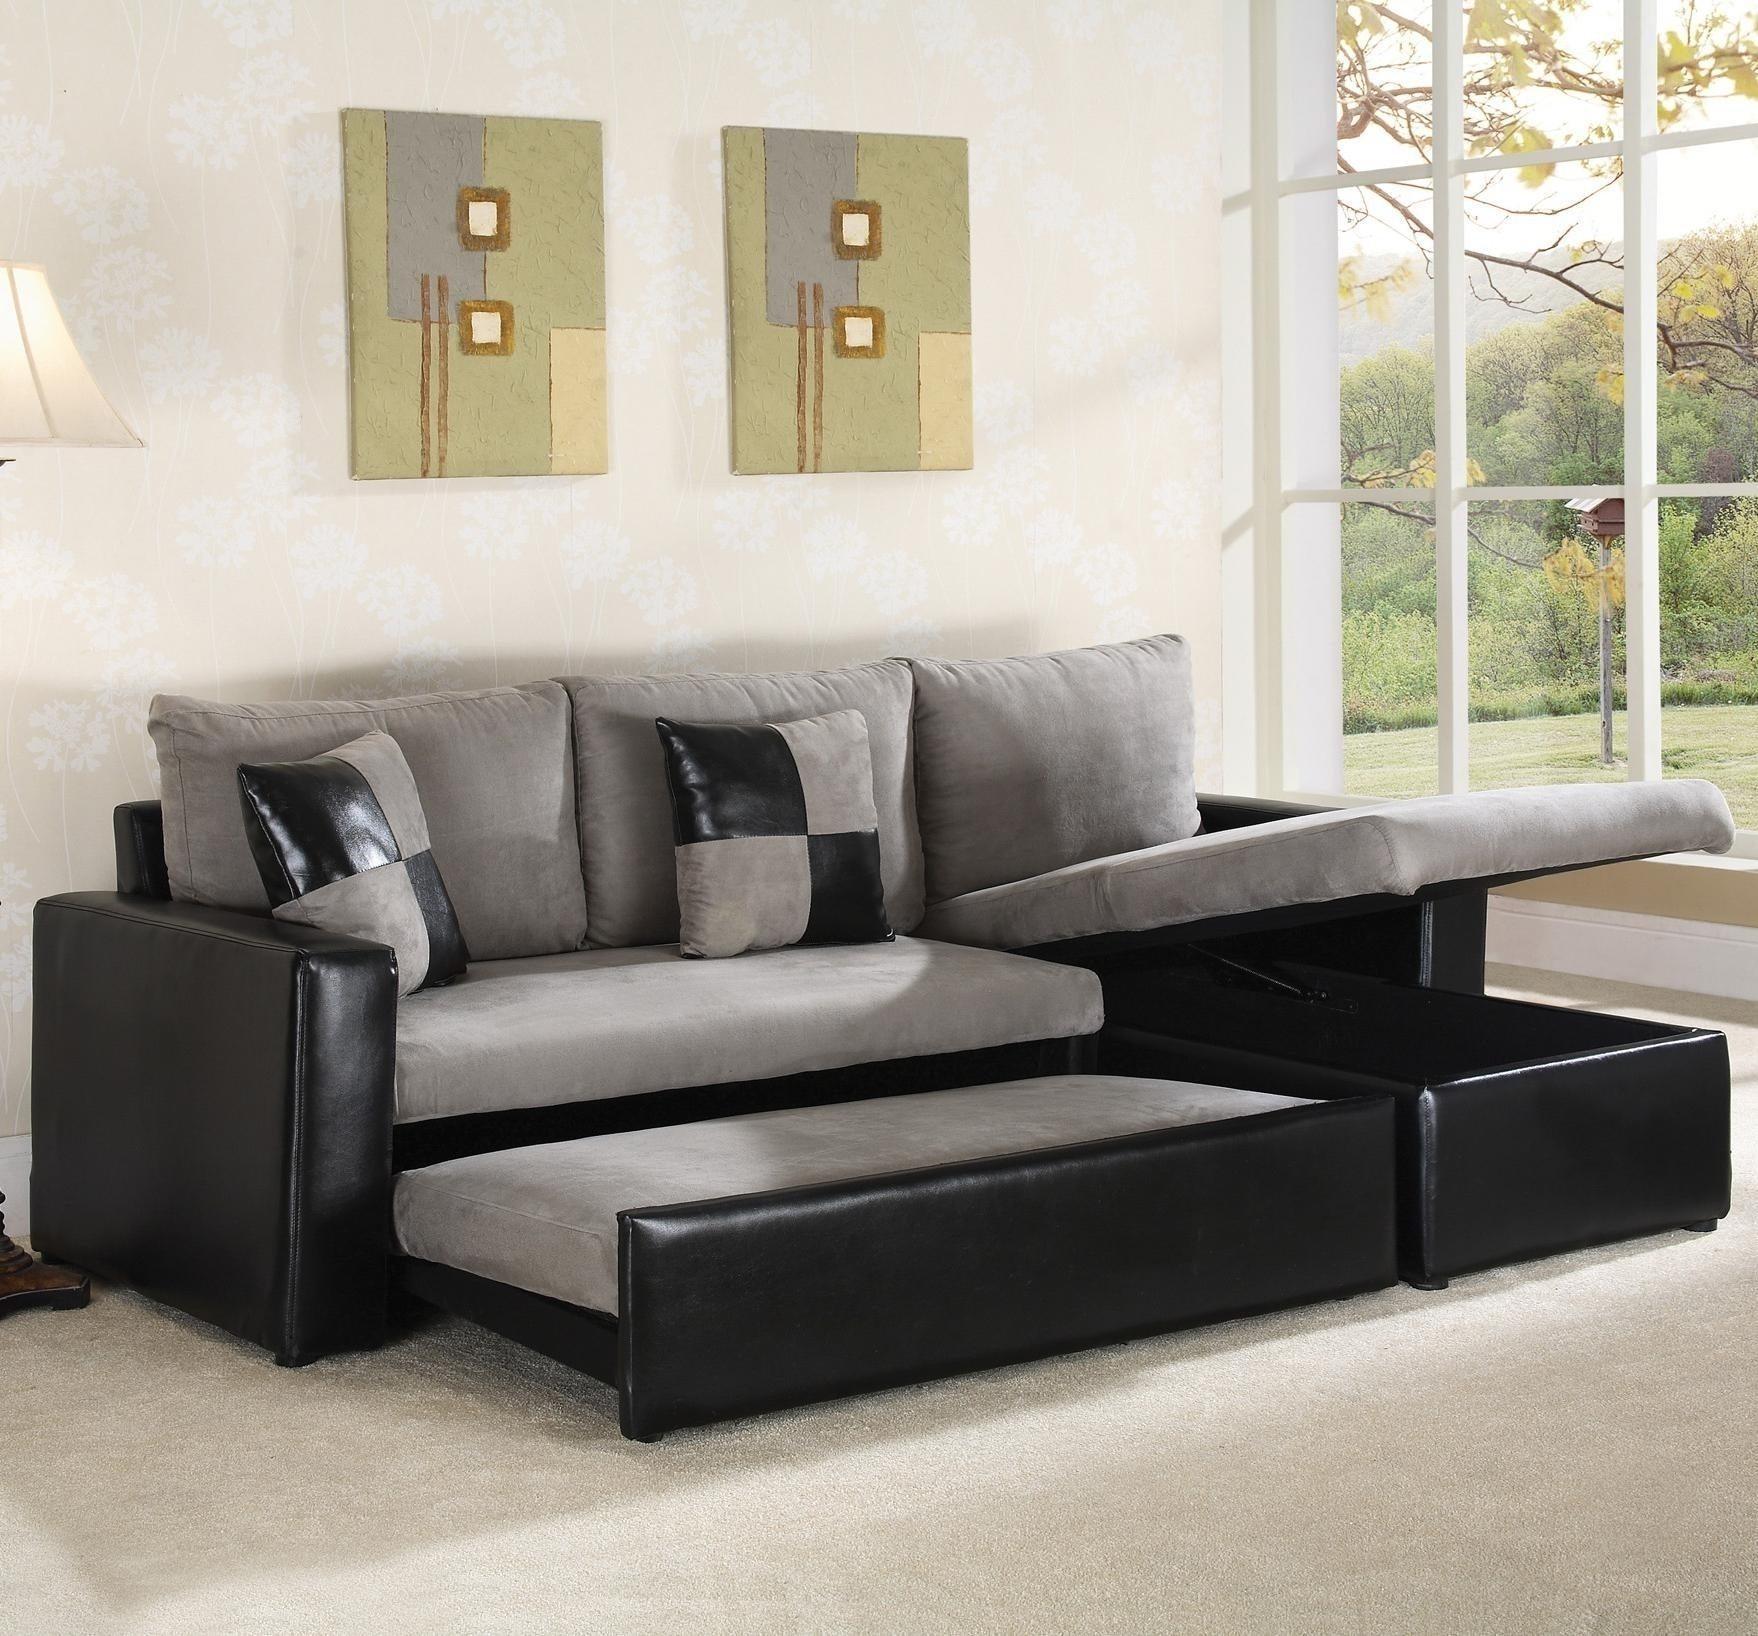 Sofas Center : Smartness Ideas Best Leather Sleeper Sofa Natuzzi Throughout Sears Sleeper Sofas (Image 16 of 20)